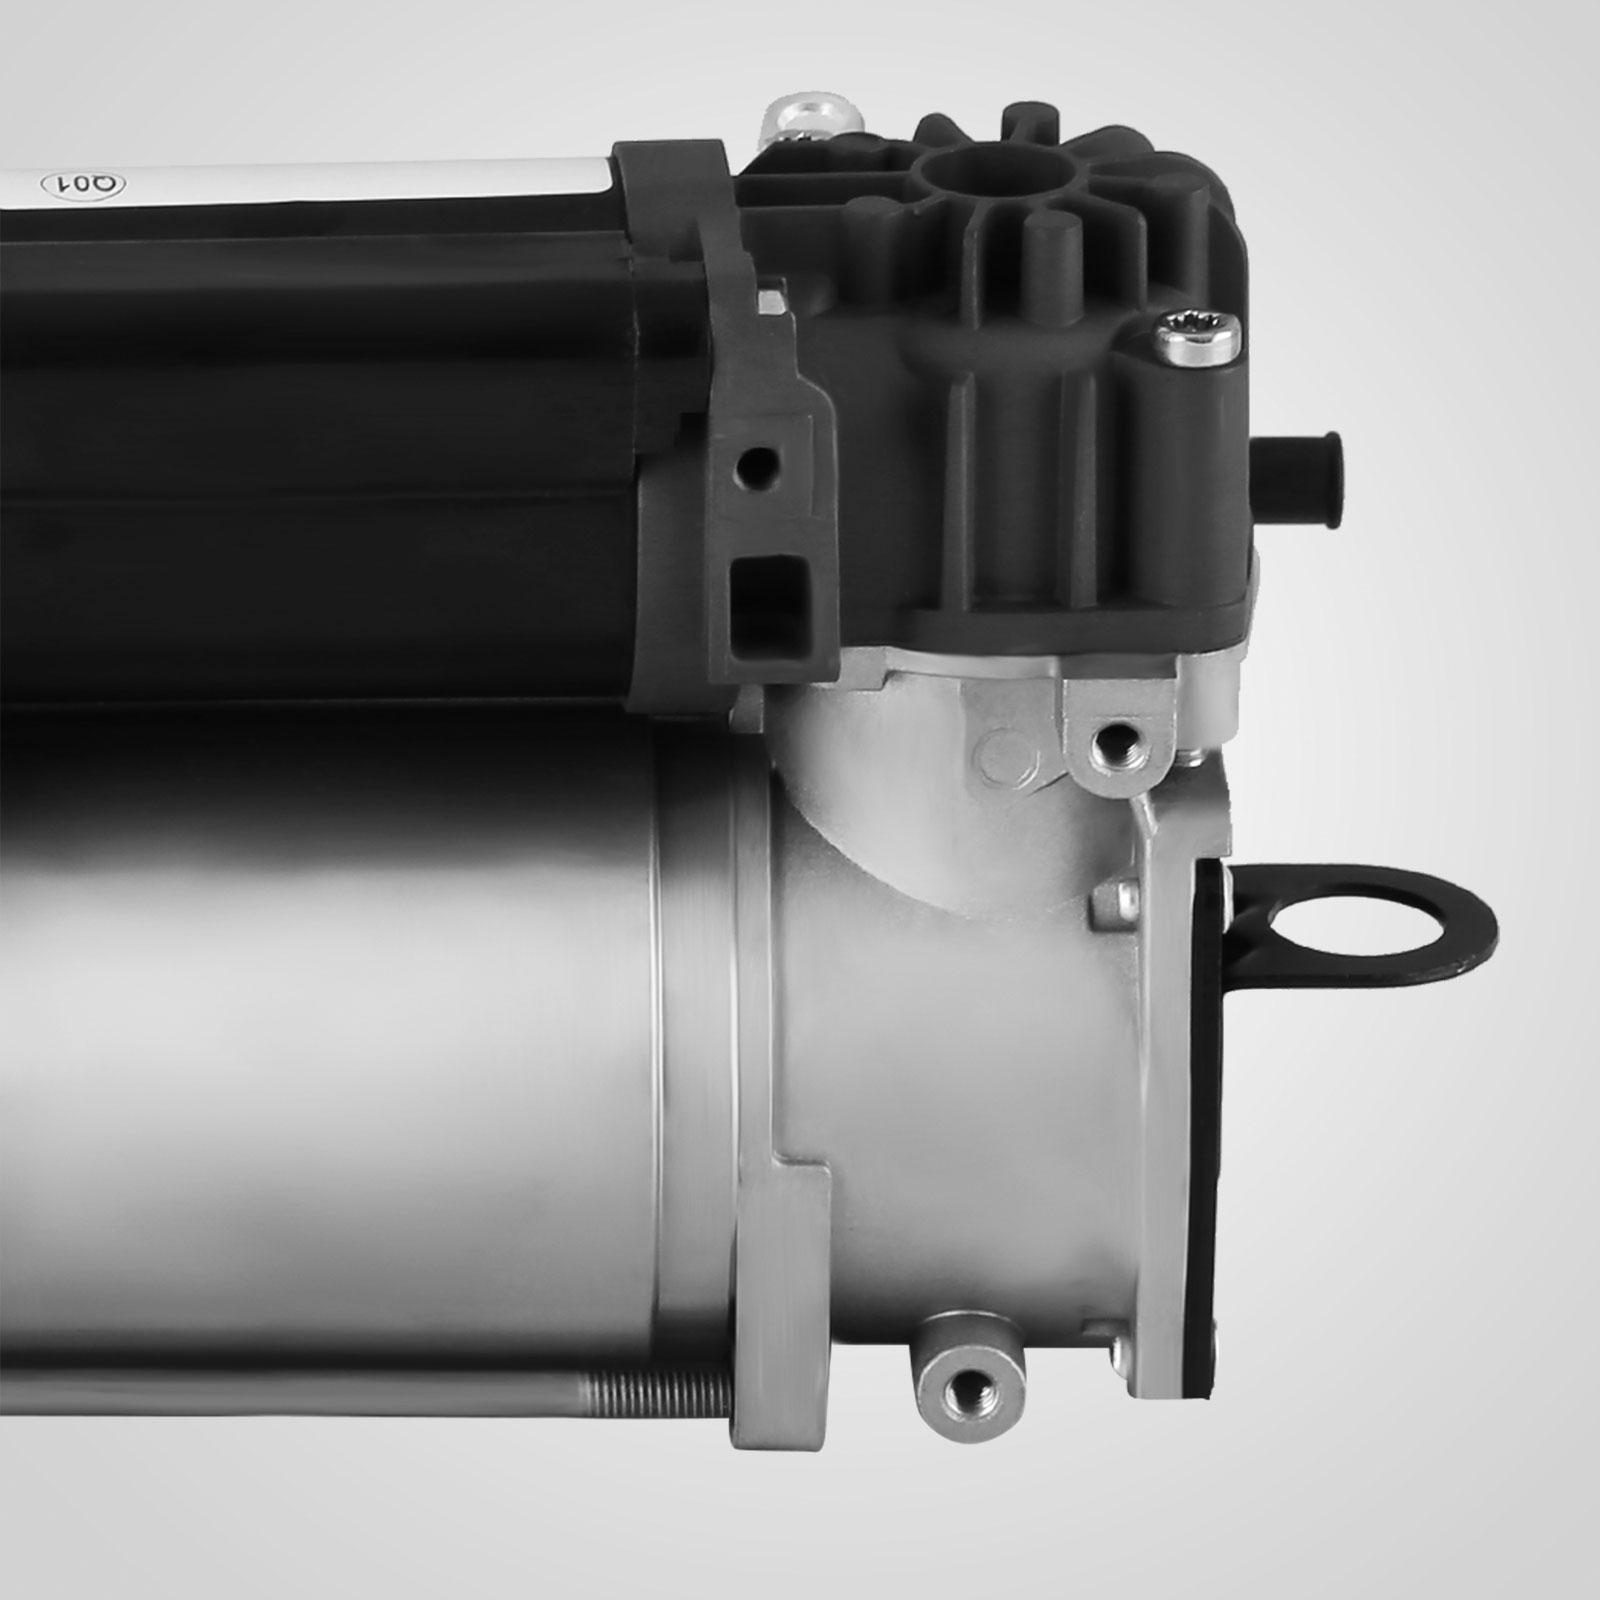 2009 Audi A8 Suspension: Compressor Air Suspension Pump 4E0616007 For Audi A8 D3